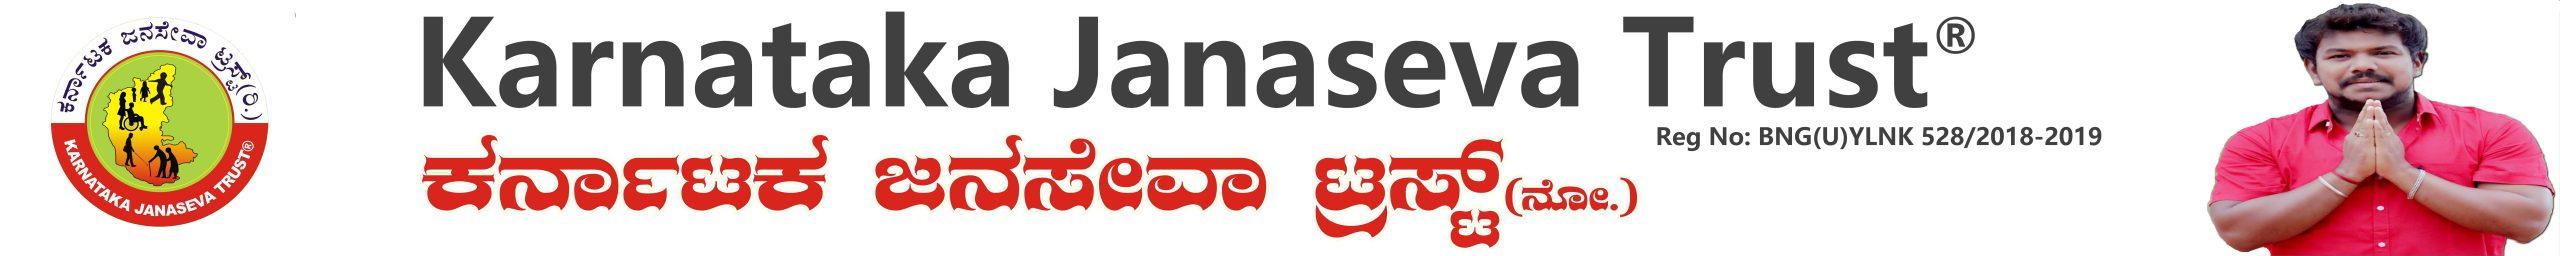 Karnataka Janaseva Trust